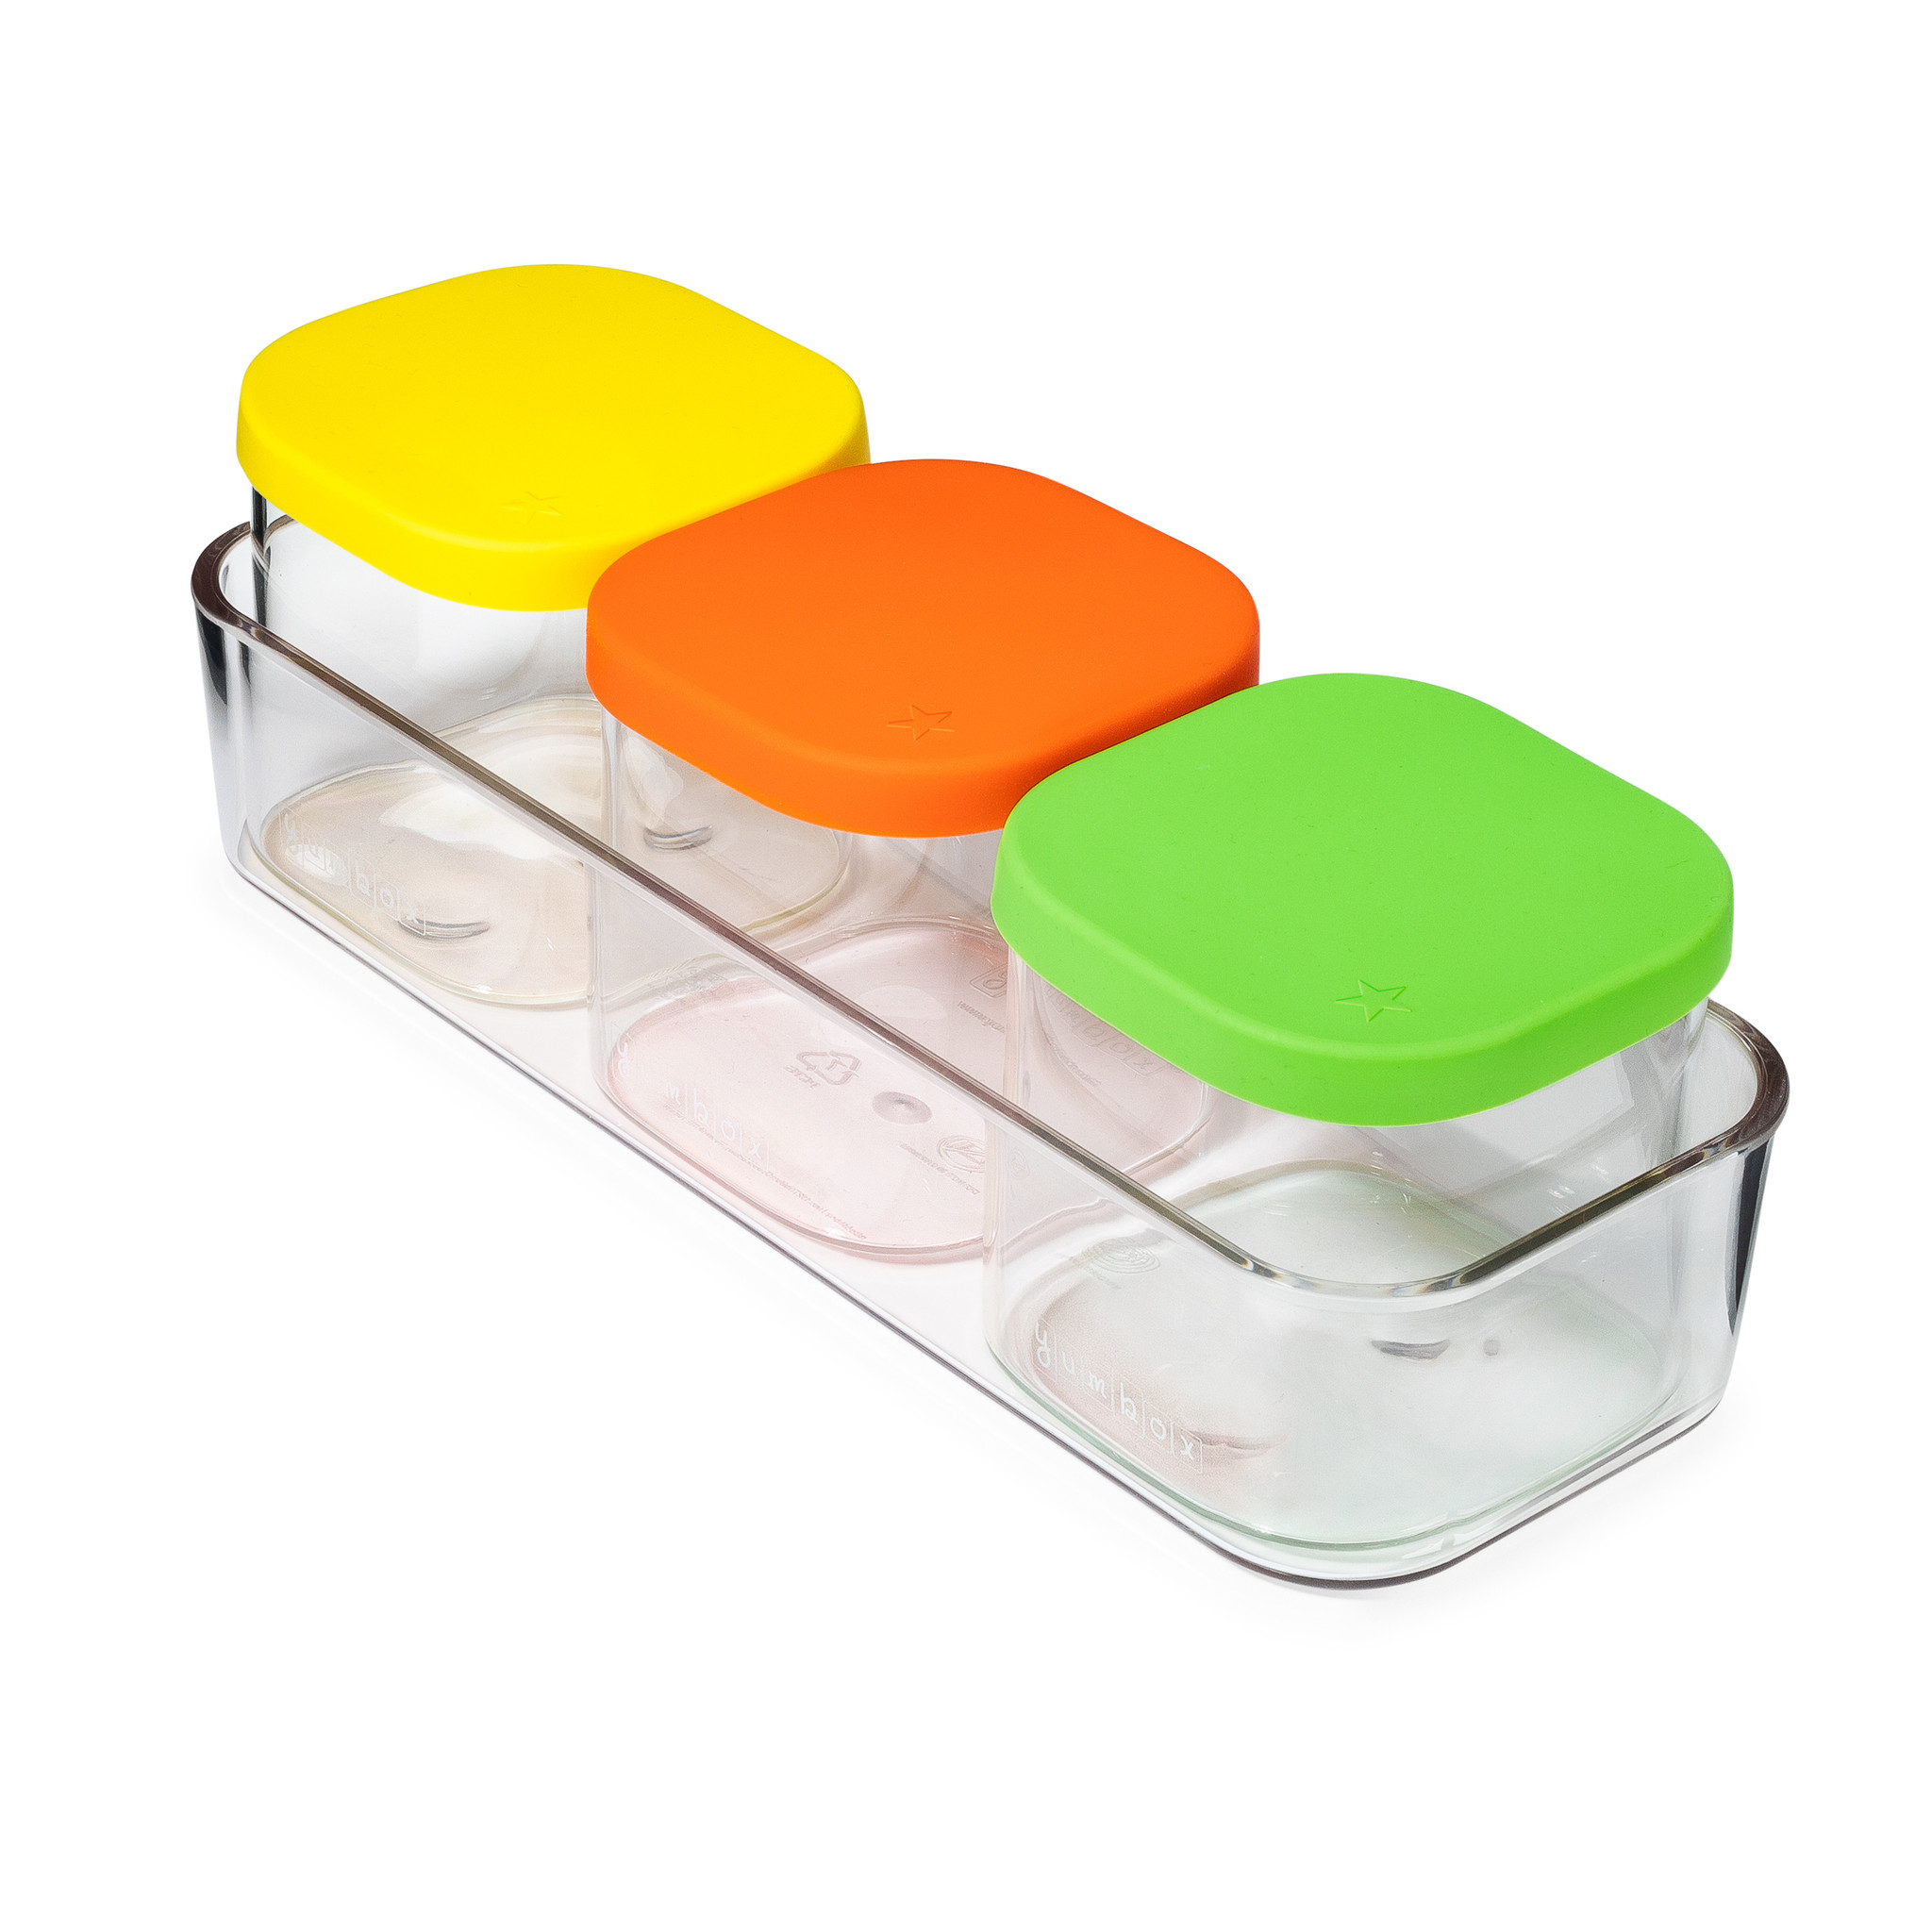 Yumbox Chop Chop tray, rectangular-9